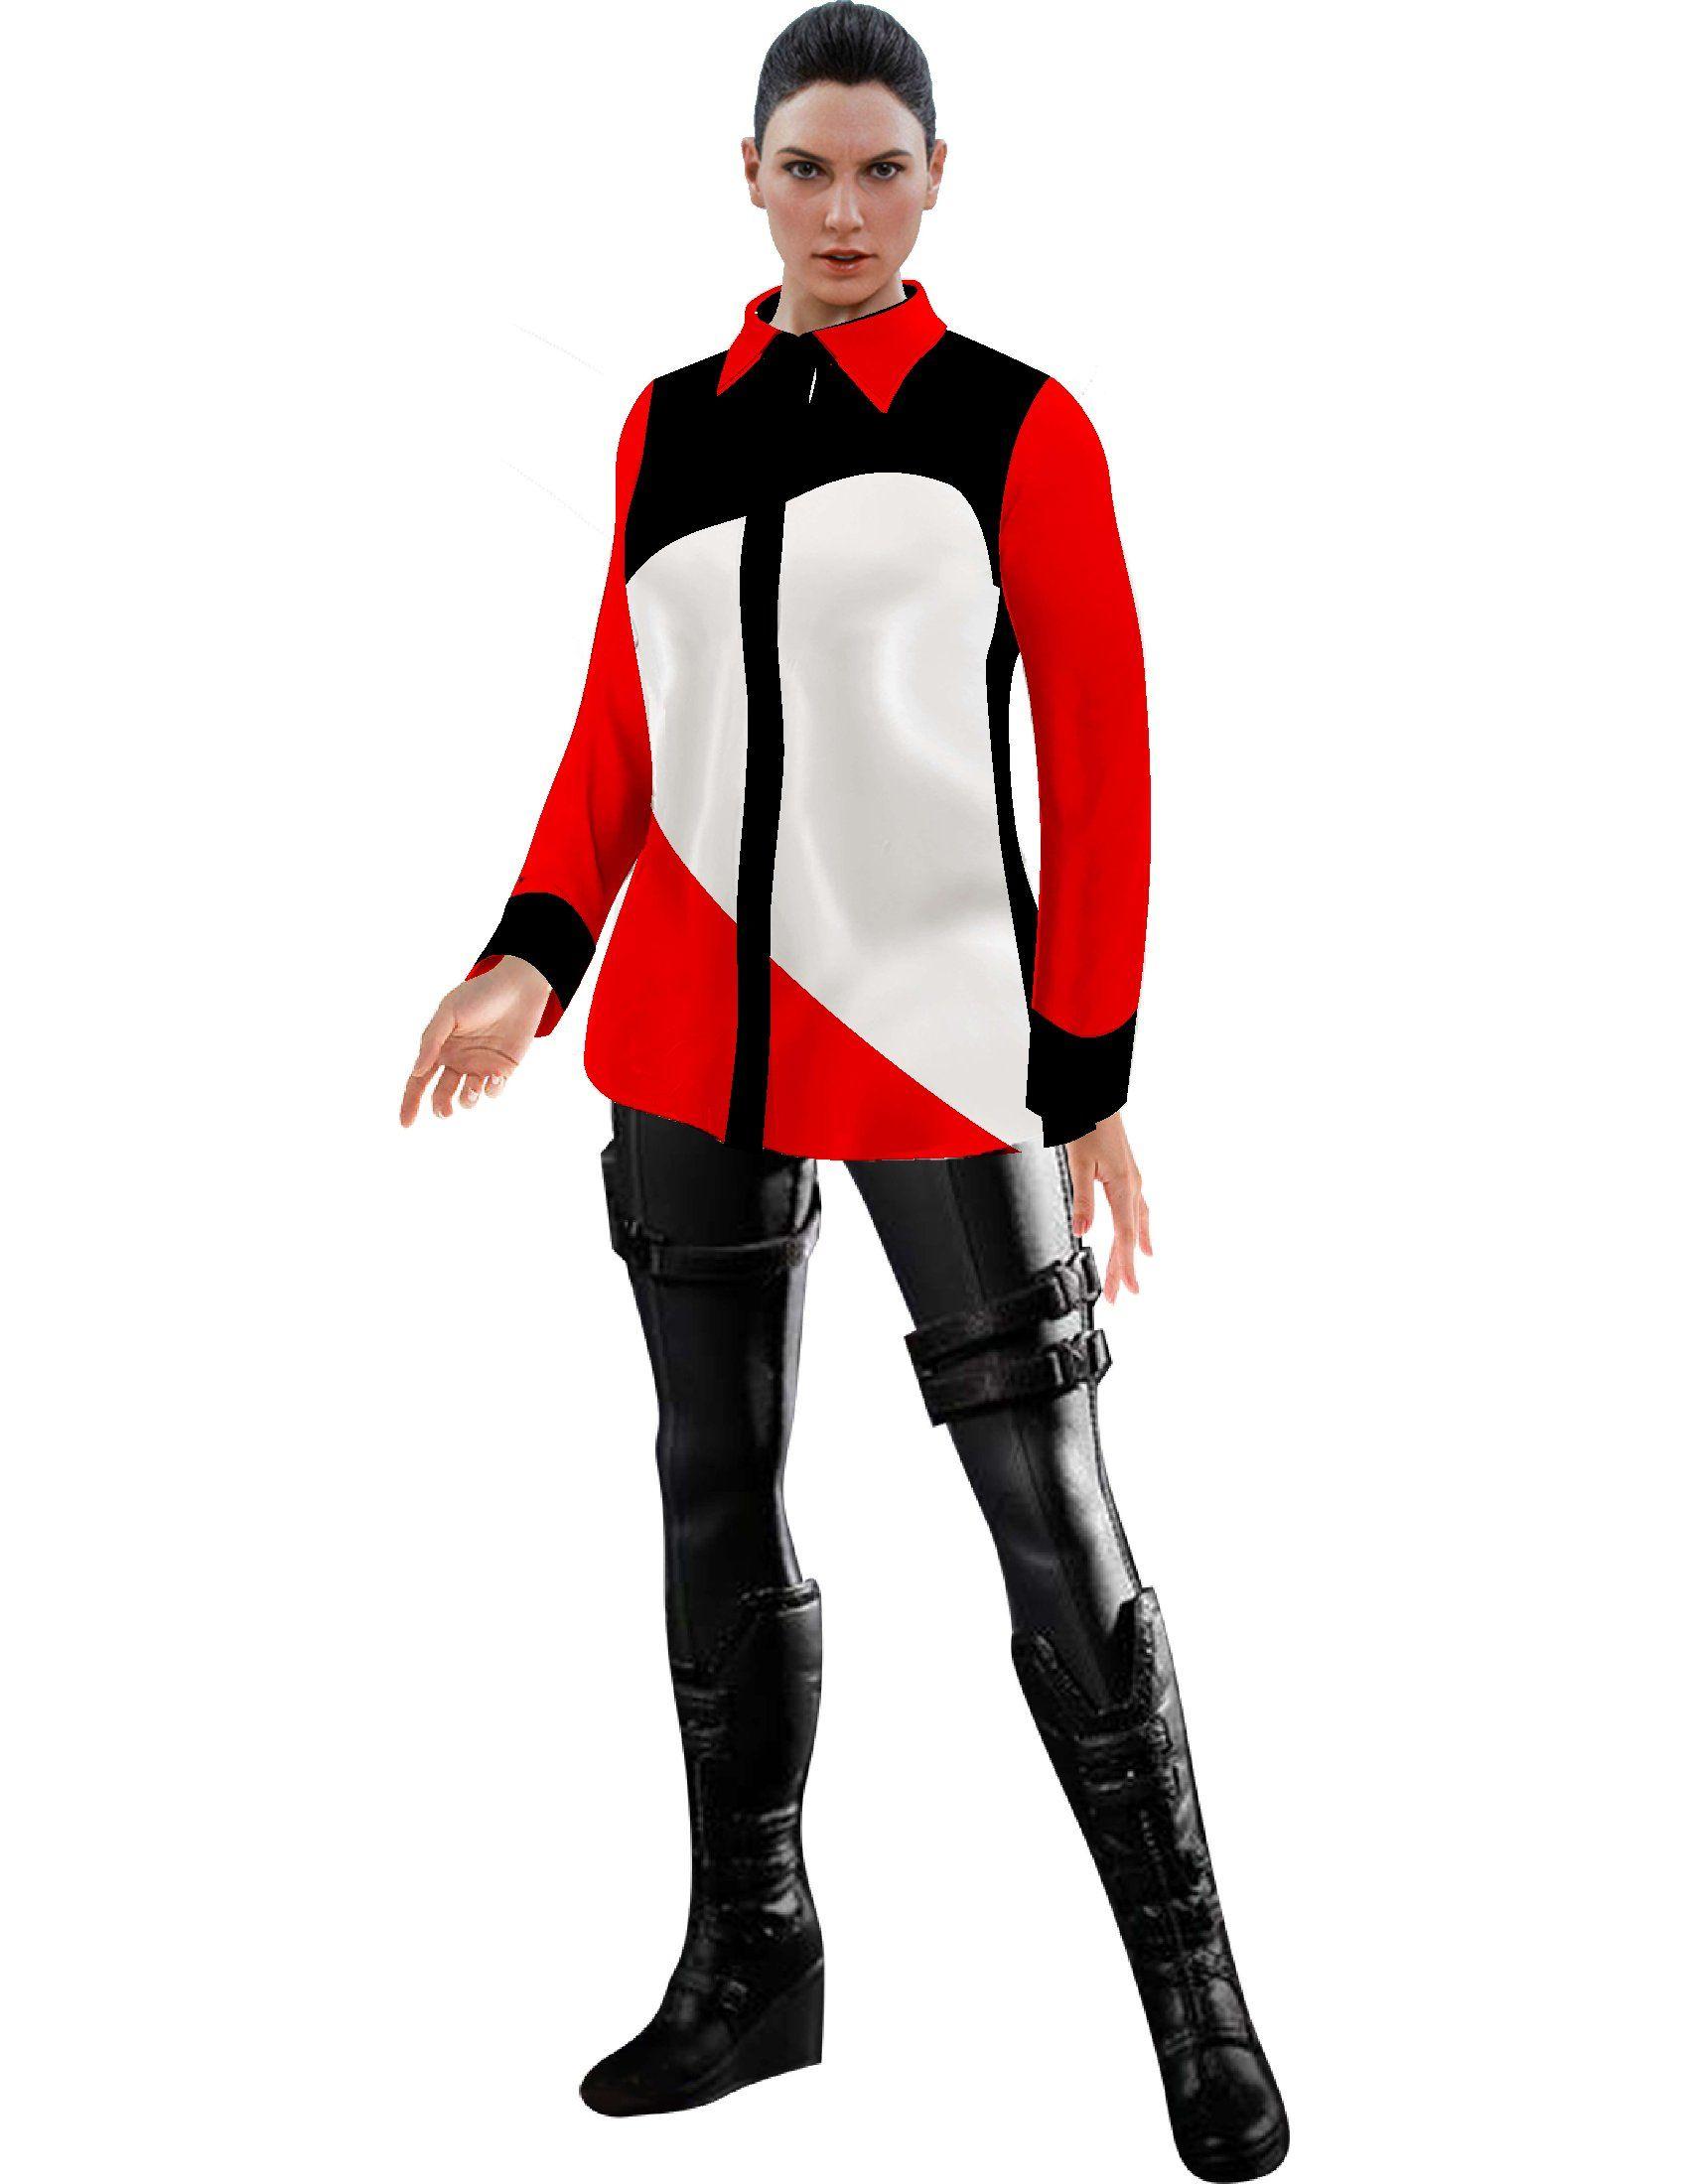 Baju Korporat Corporate uniforms